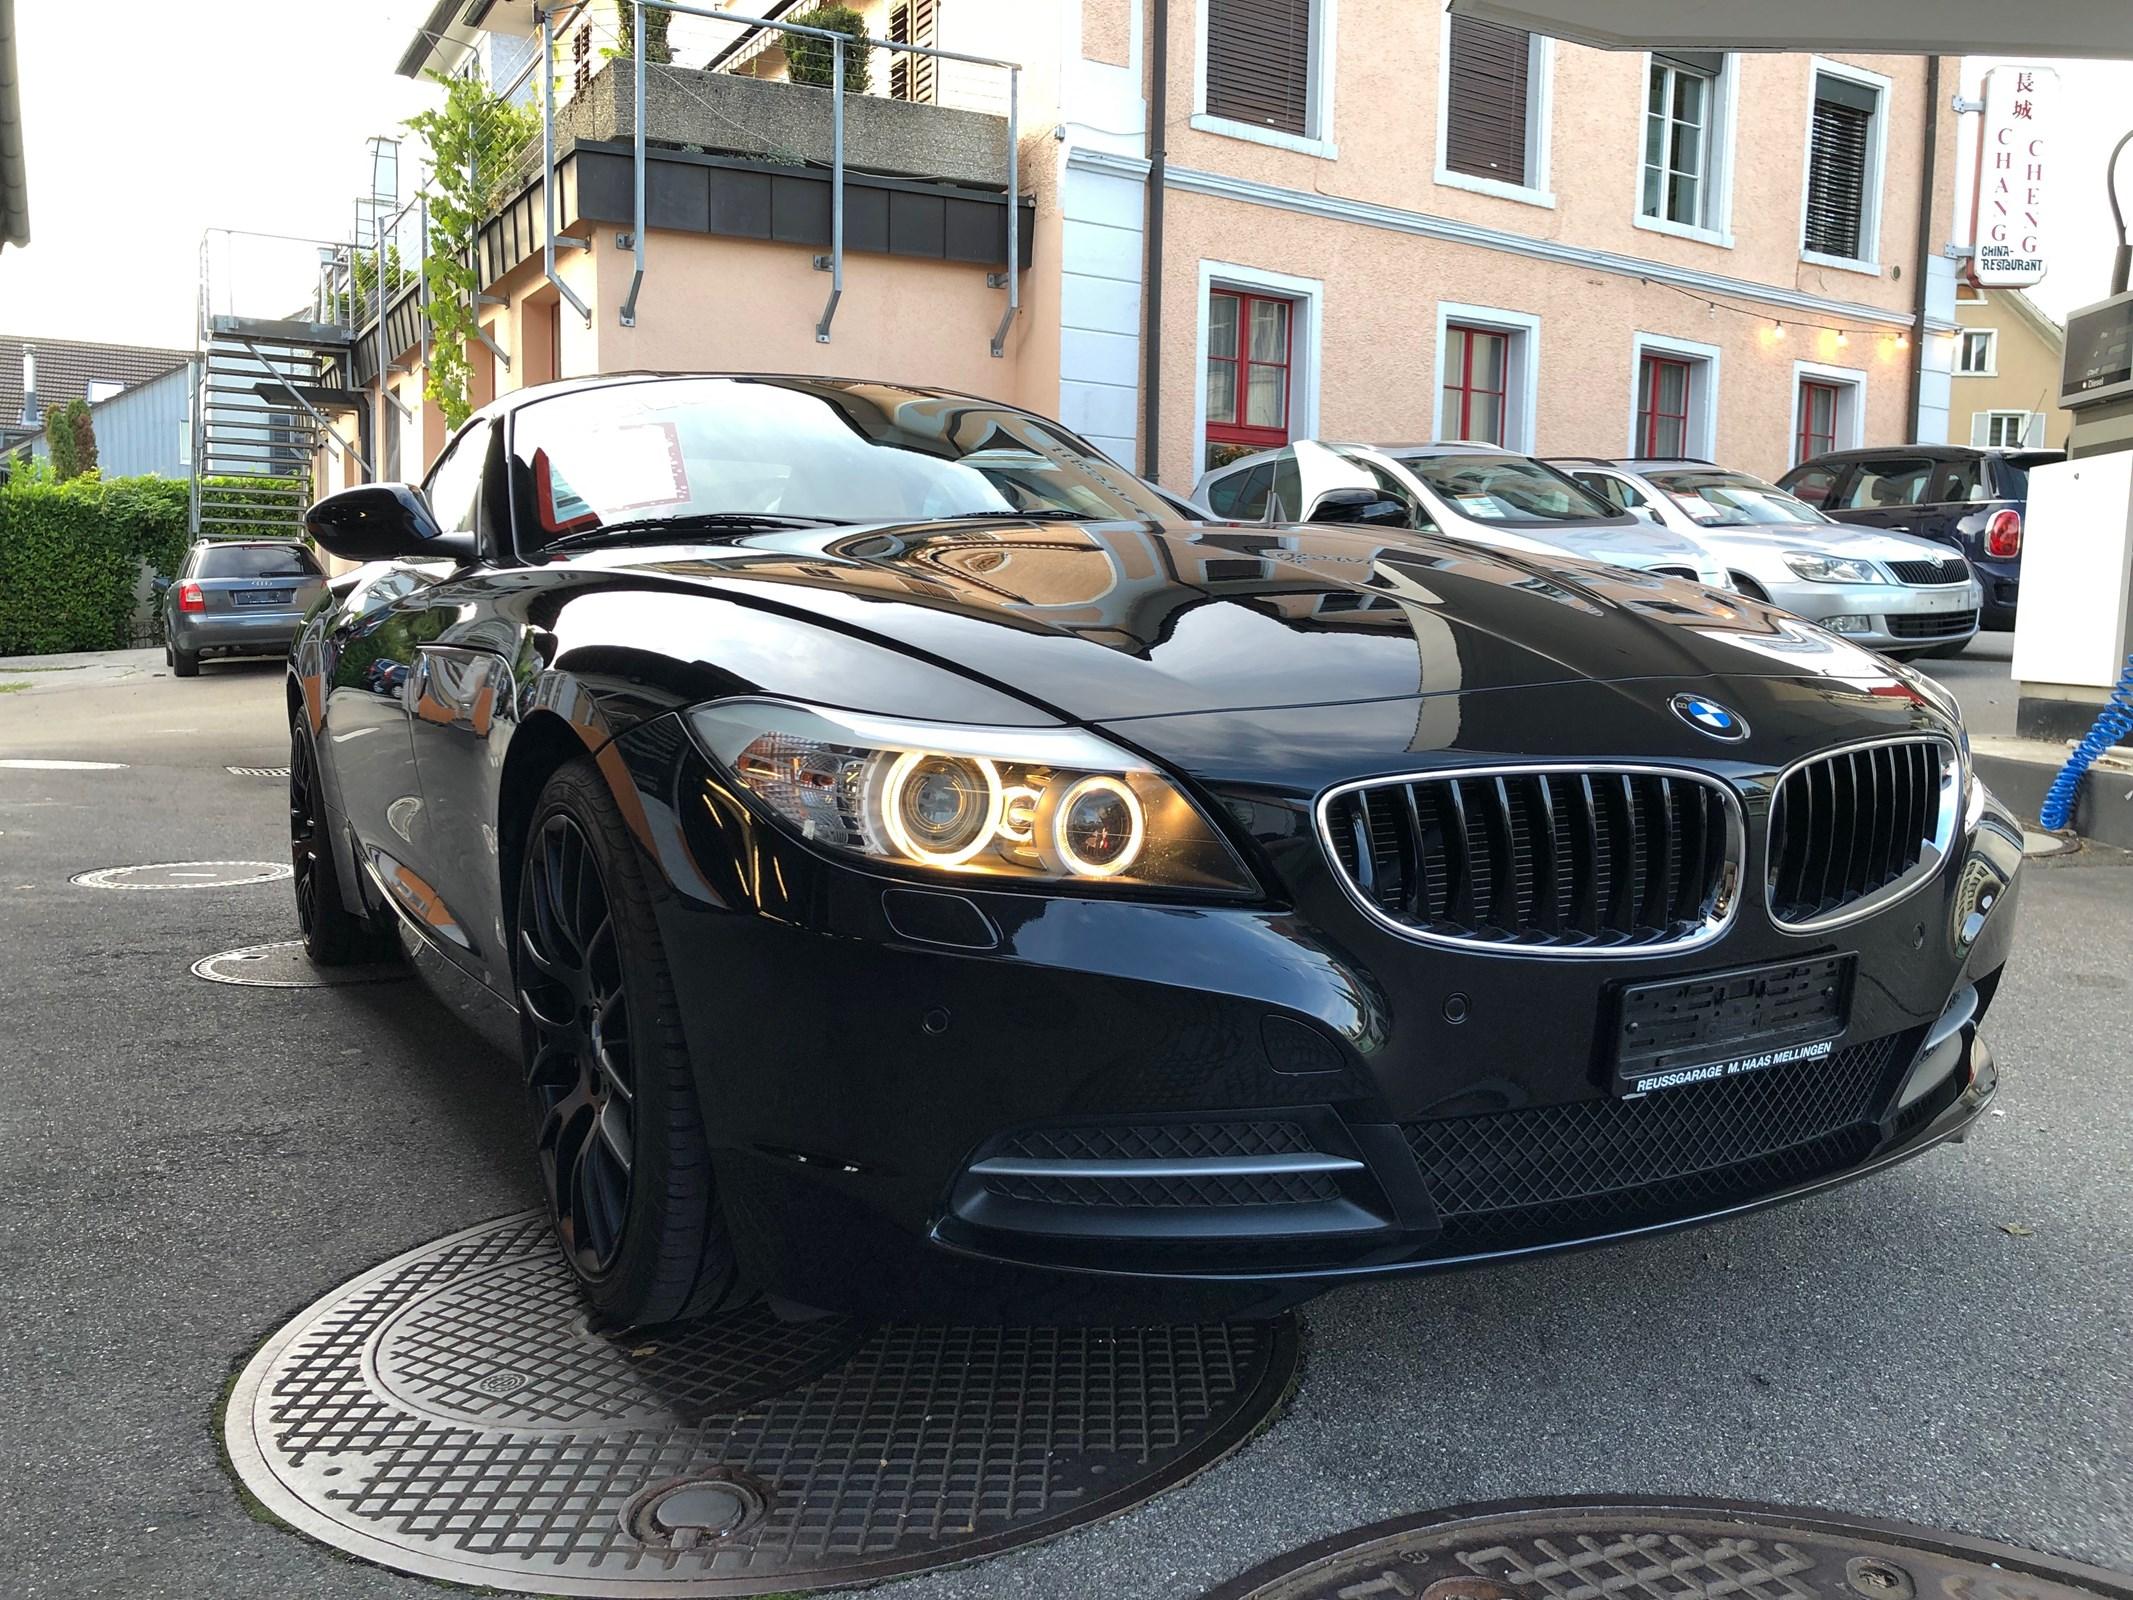 cabriolet BMW Z4 sDrive23i